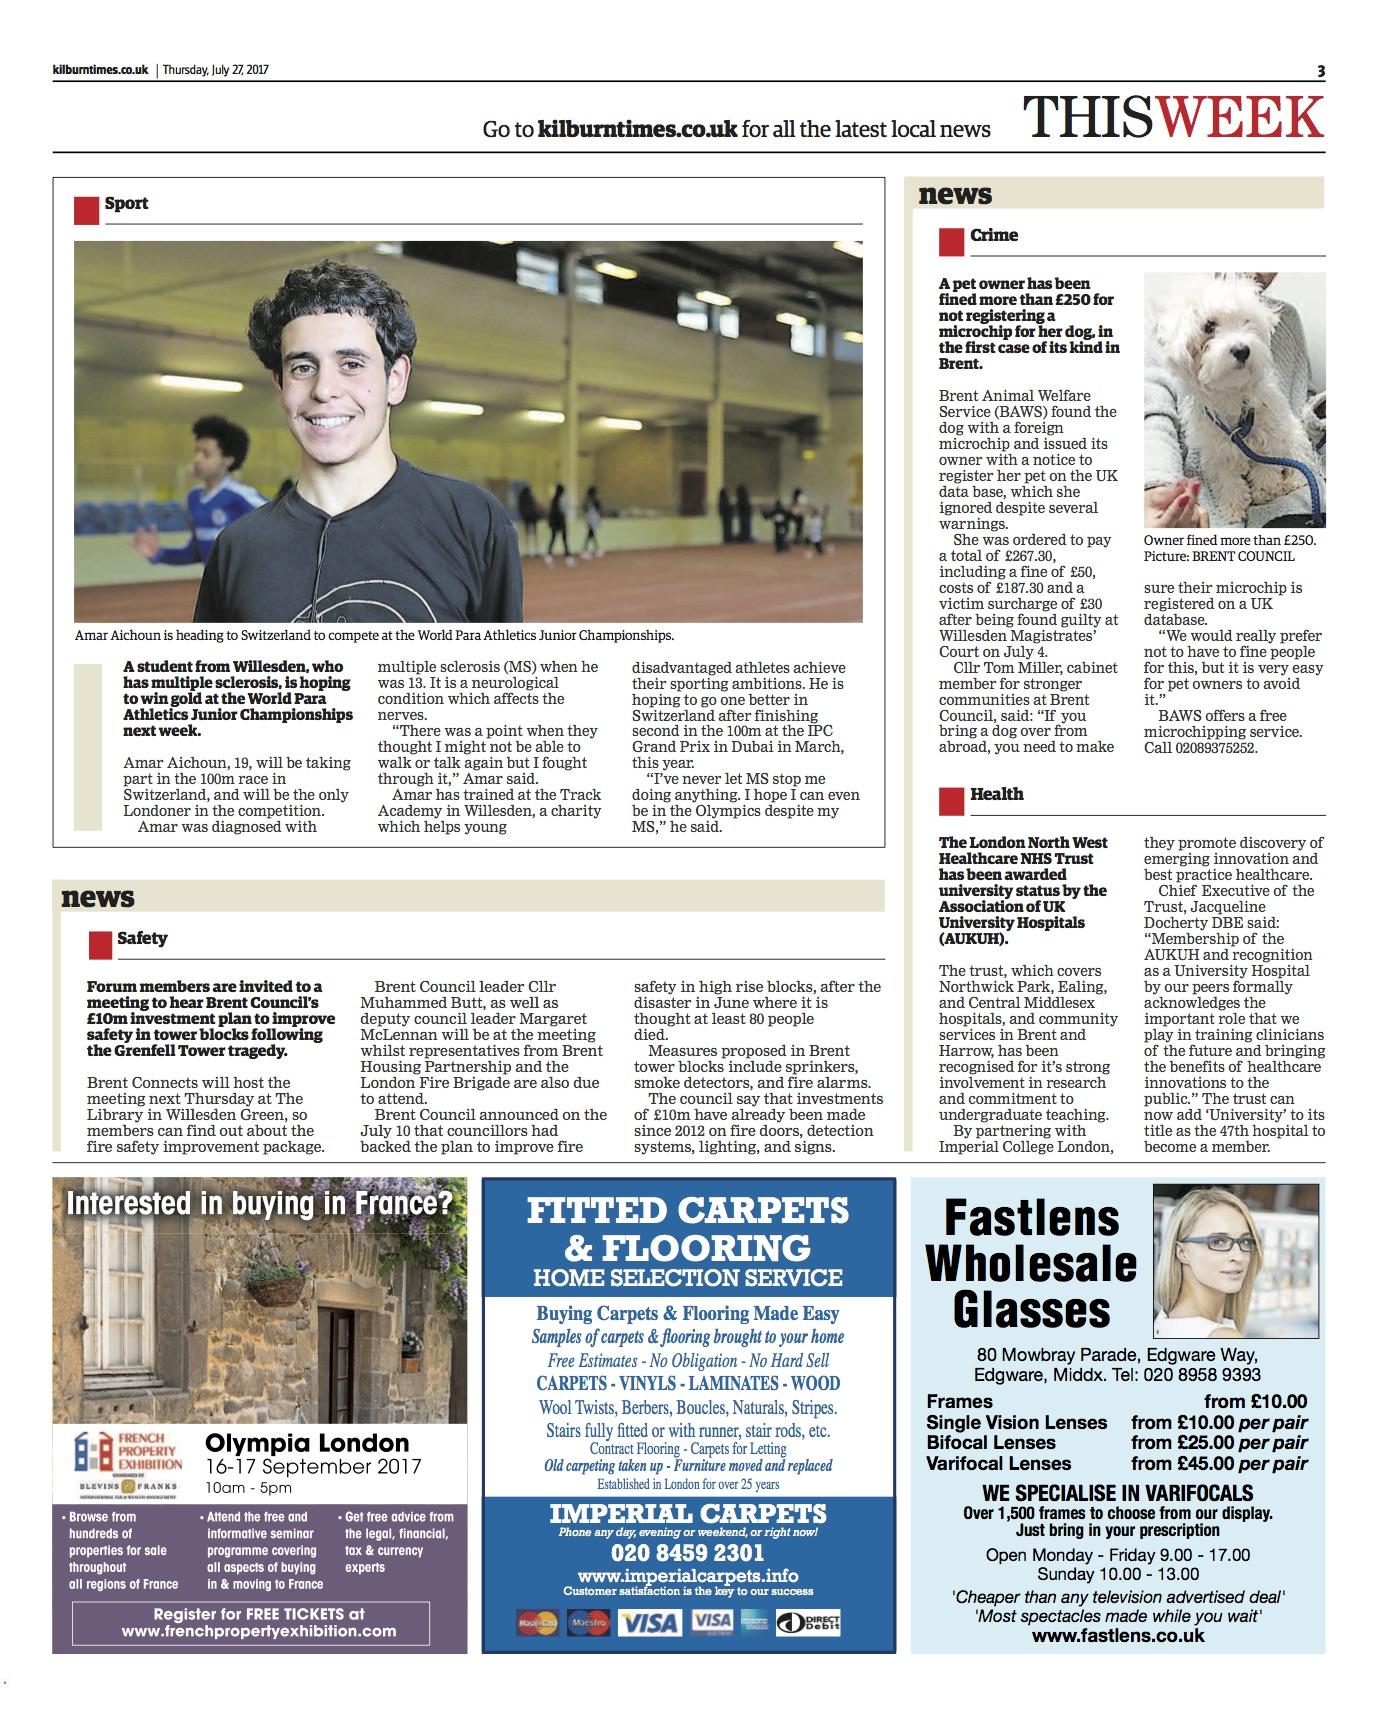 Kilburn Times, Track Academy, Amar Aichoun